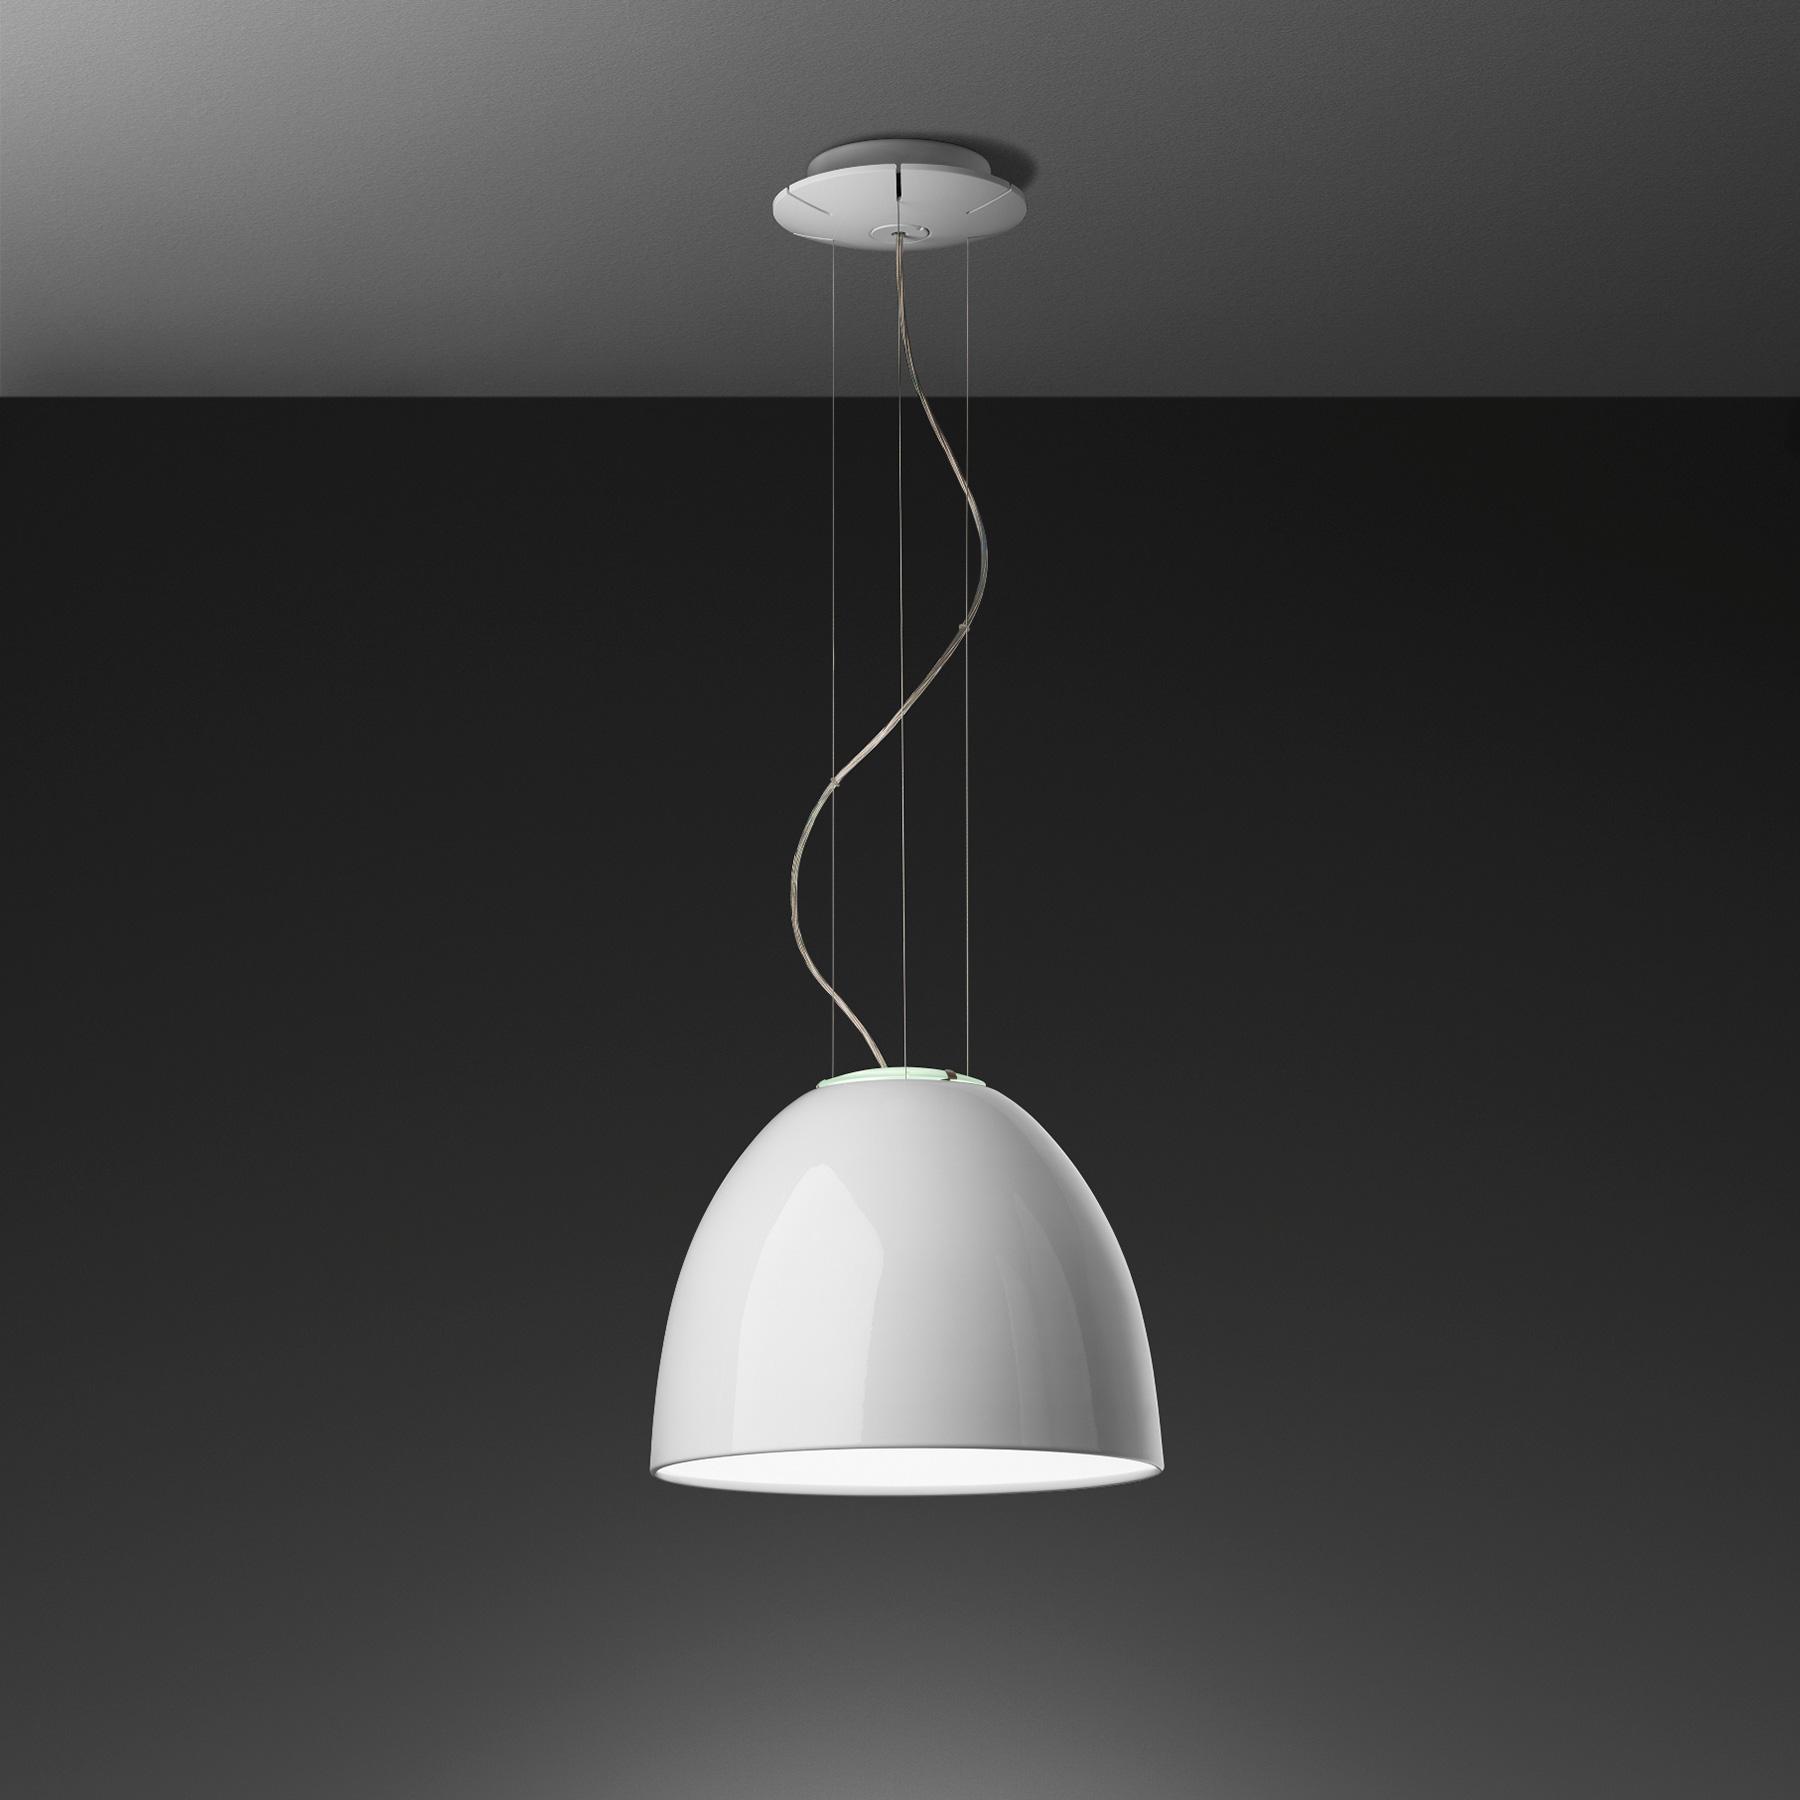 Artemide Nur Mini Gloss LED Sospensione Pendelleuchte   A246400   Reuter Onlineshop